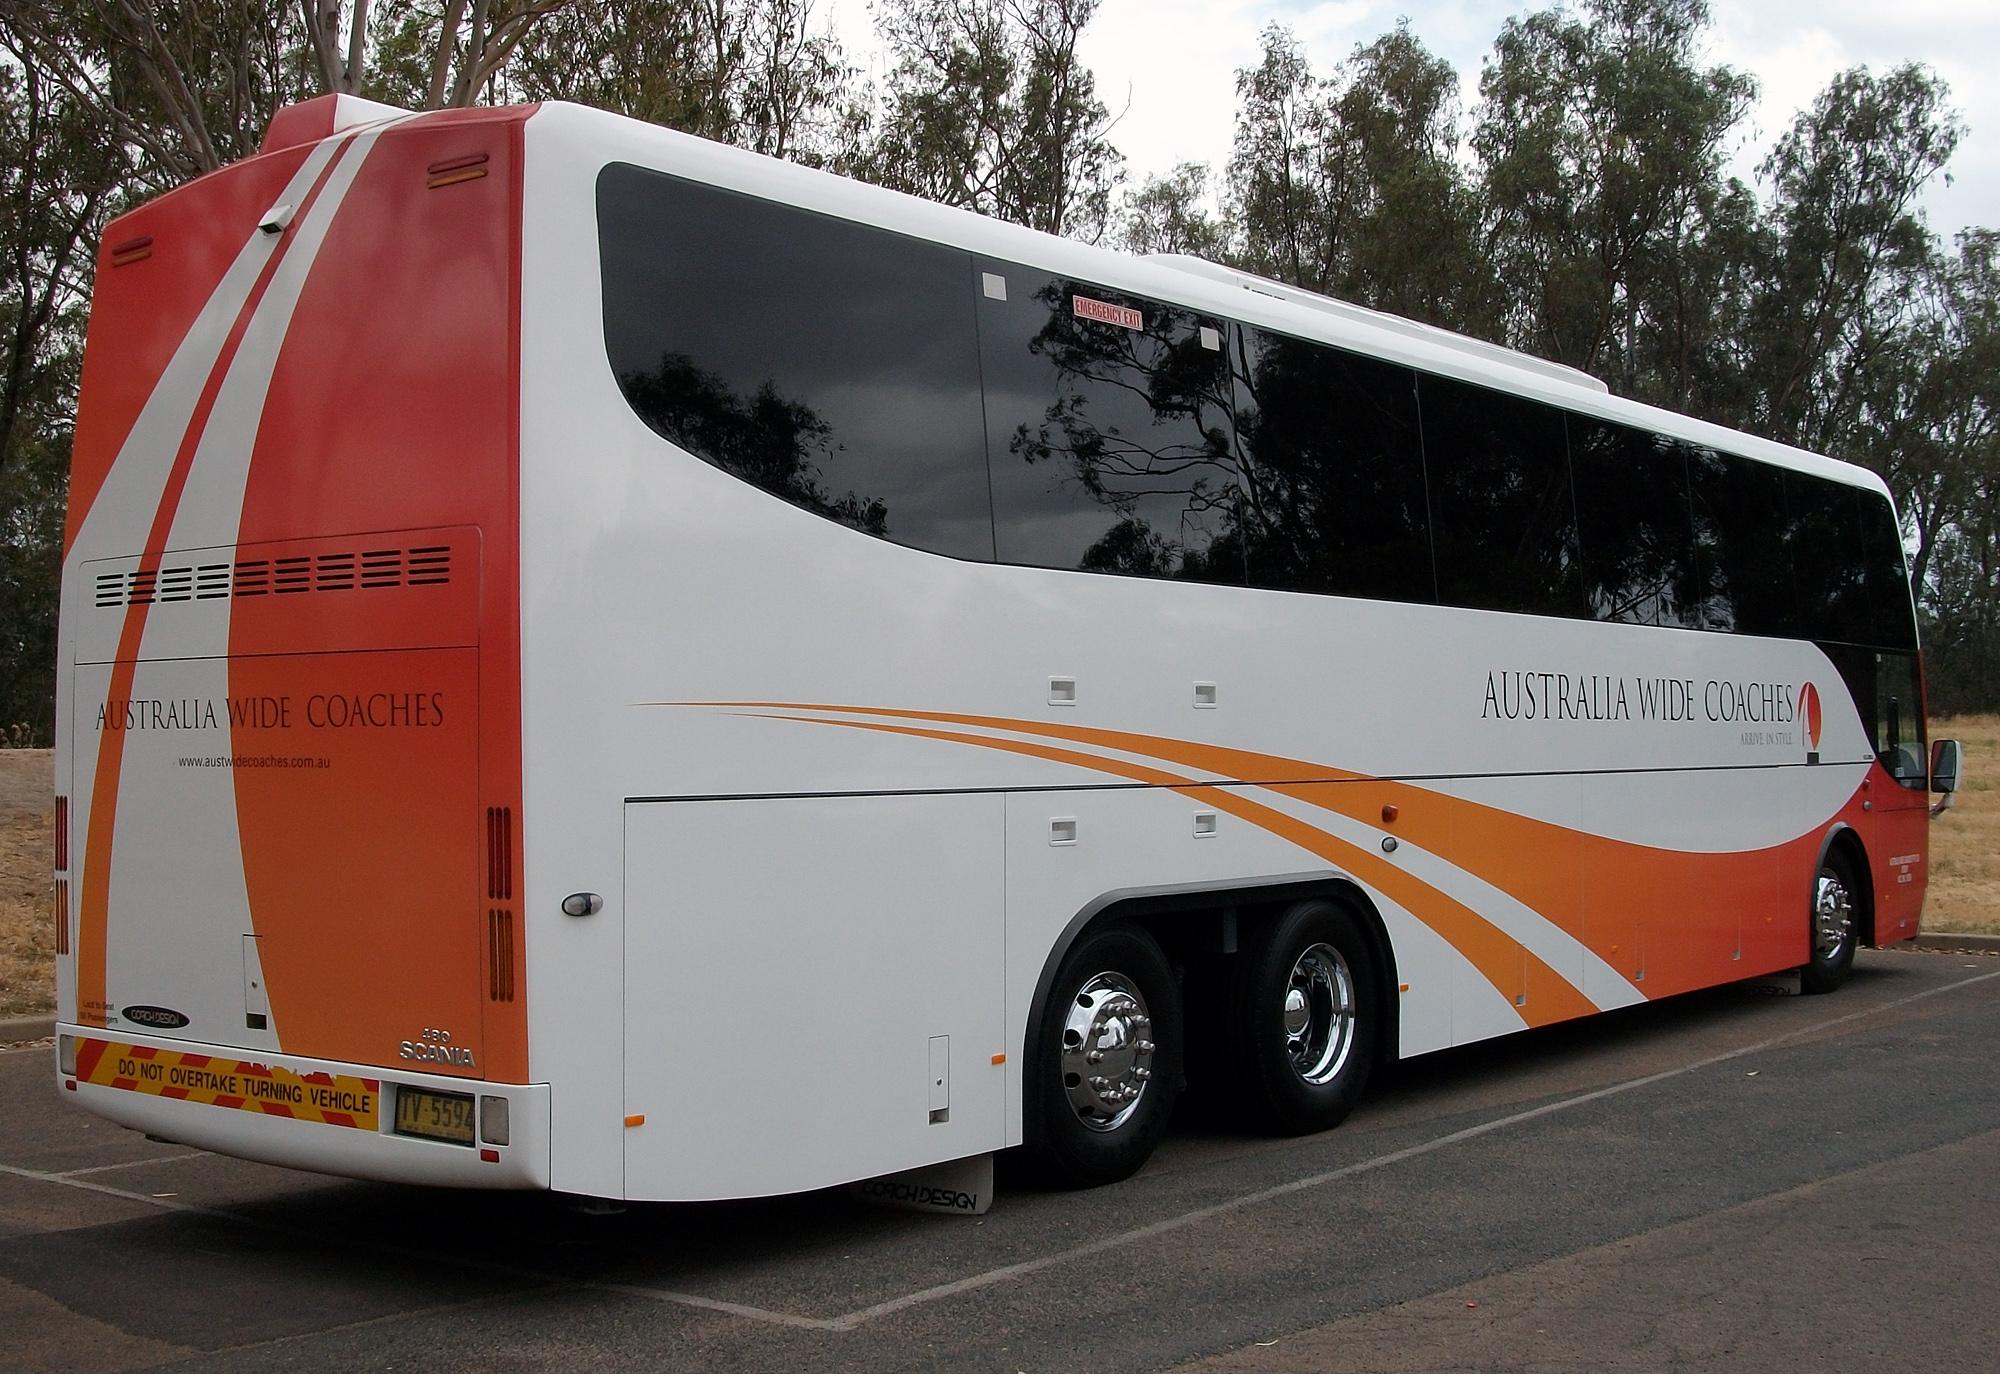 File:Australia Wide Coaches - Coach Design bodied Scania K480EB Opticruise - TV 5594 01